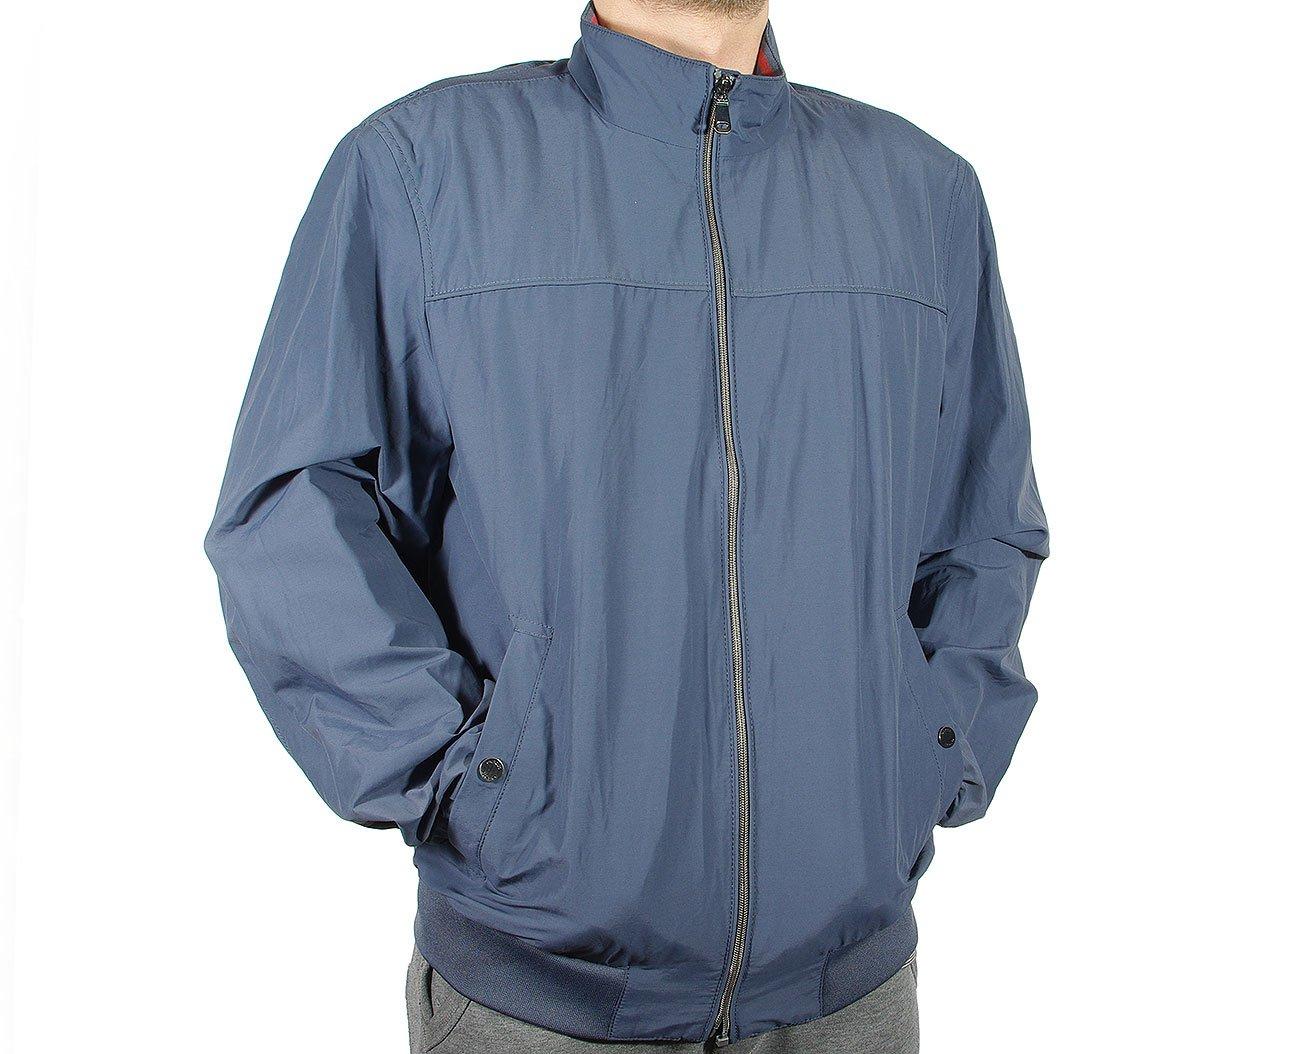 GEOX M8220D kurtka man jacket vintage indigo